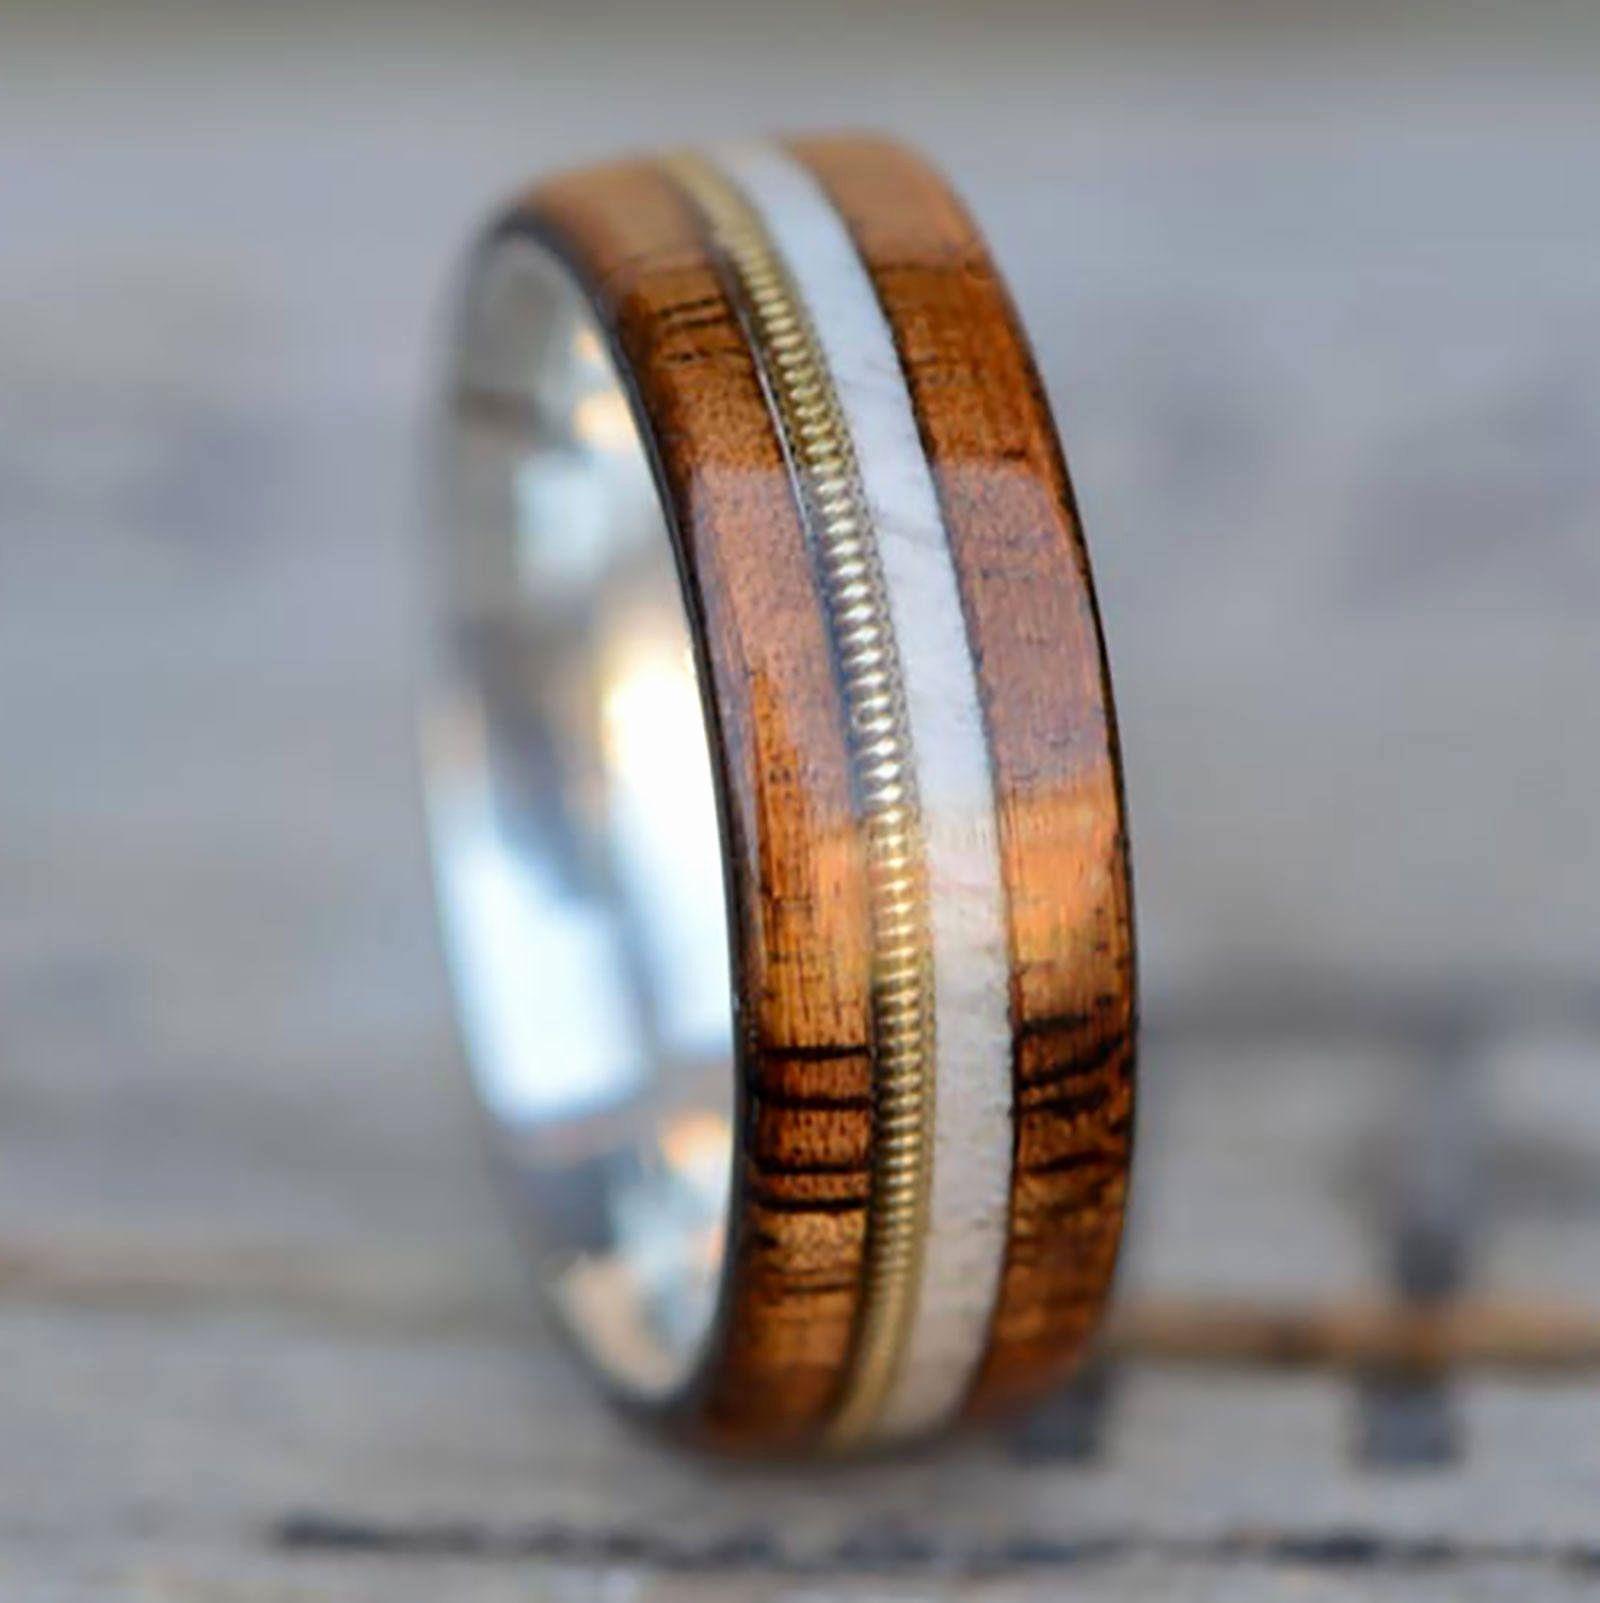 Elk ivory wedding rings unique men s wedding engagement